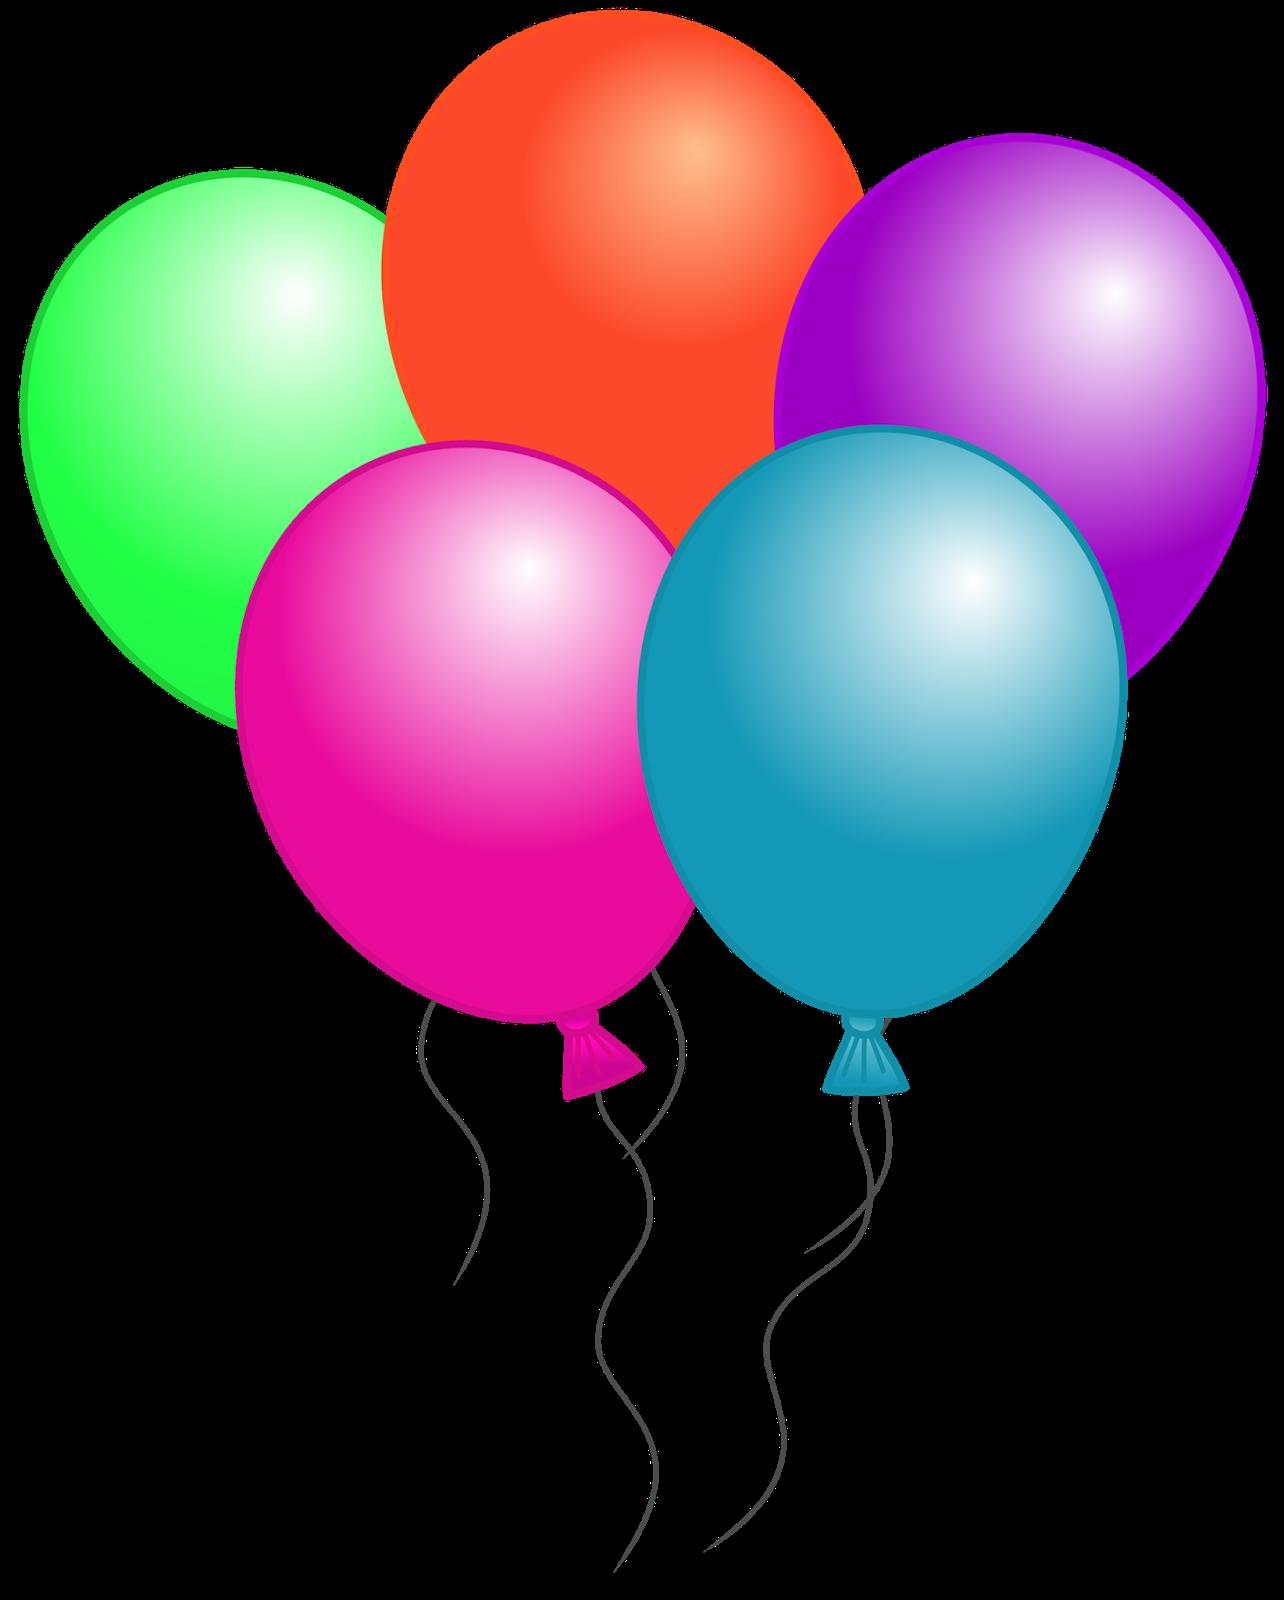 Free Birthday Balloon Clip Art | Clipart Panda - Free Clipart Images | Felt board | Pinterest | Free clipart images, Art clipart and Birthdays